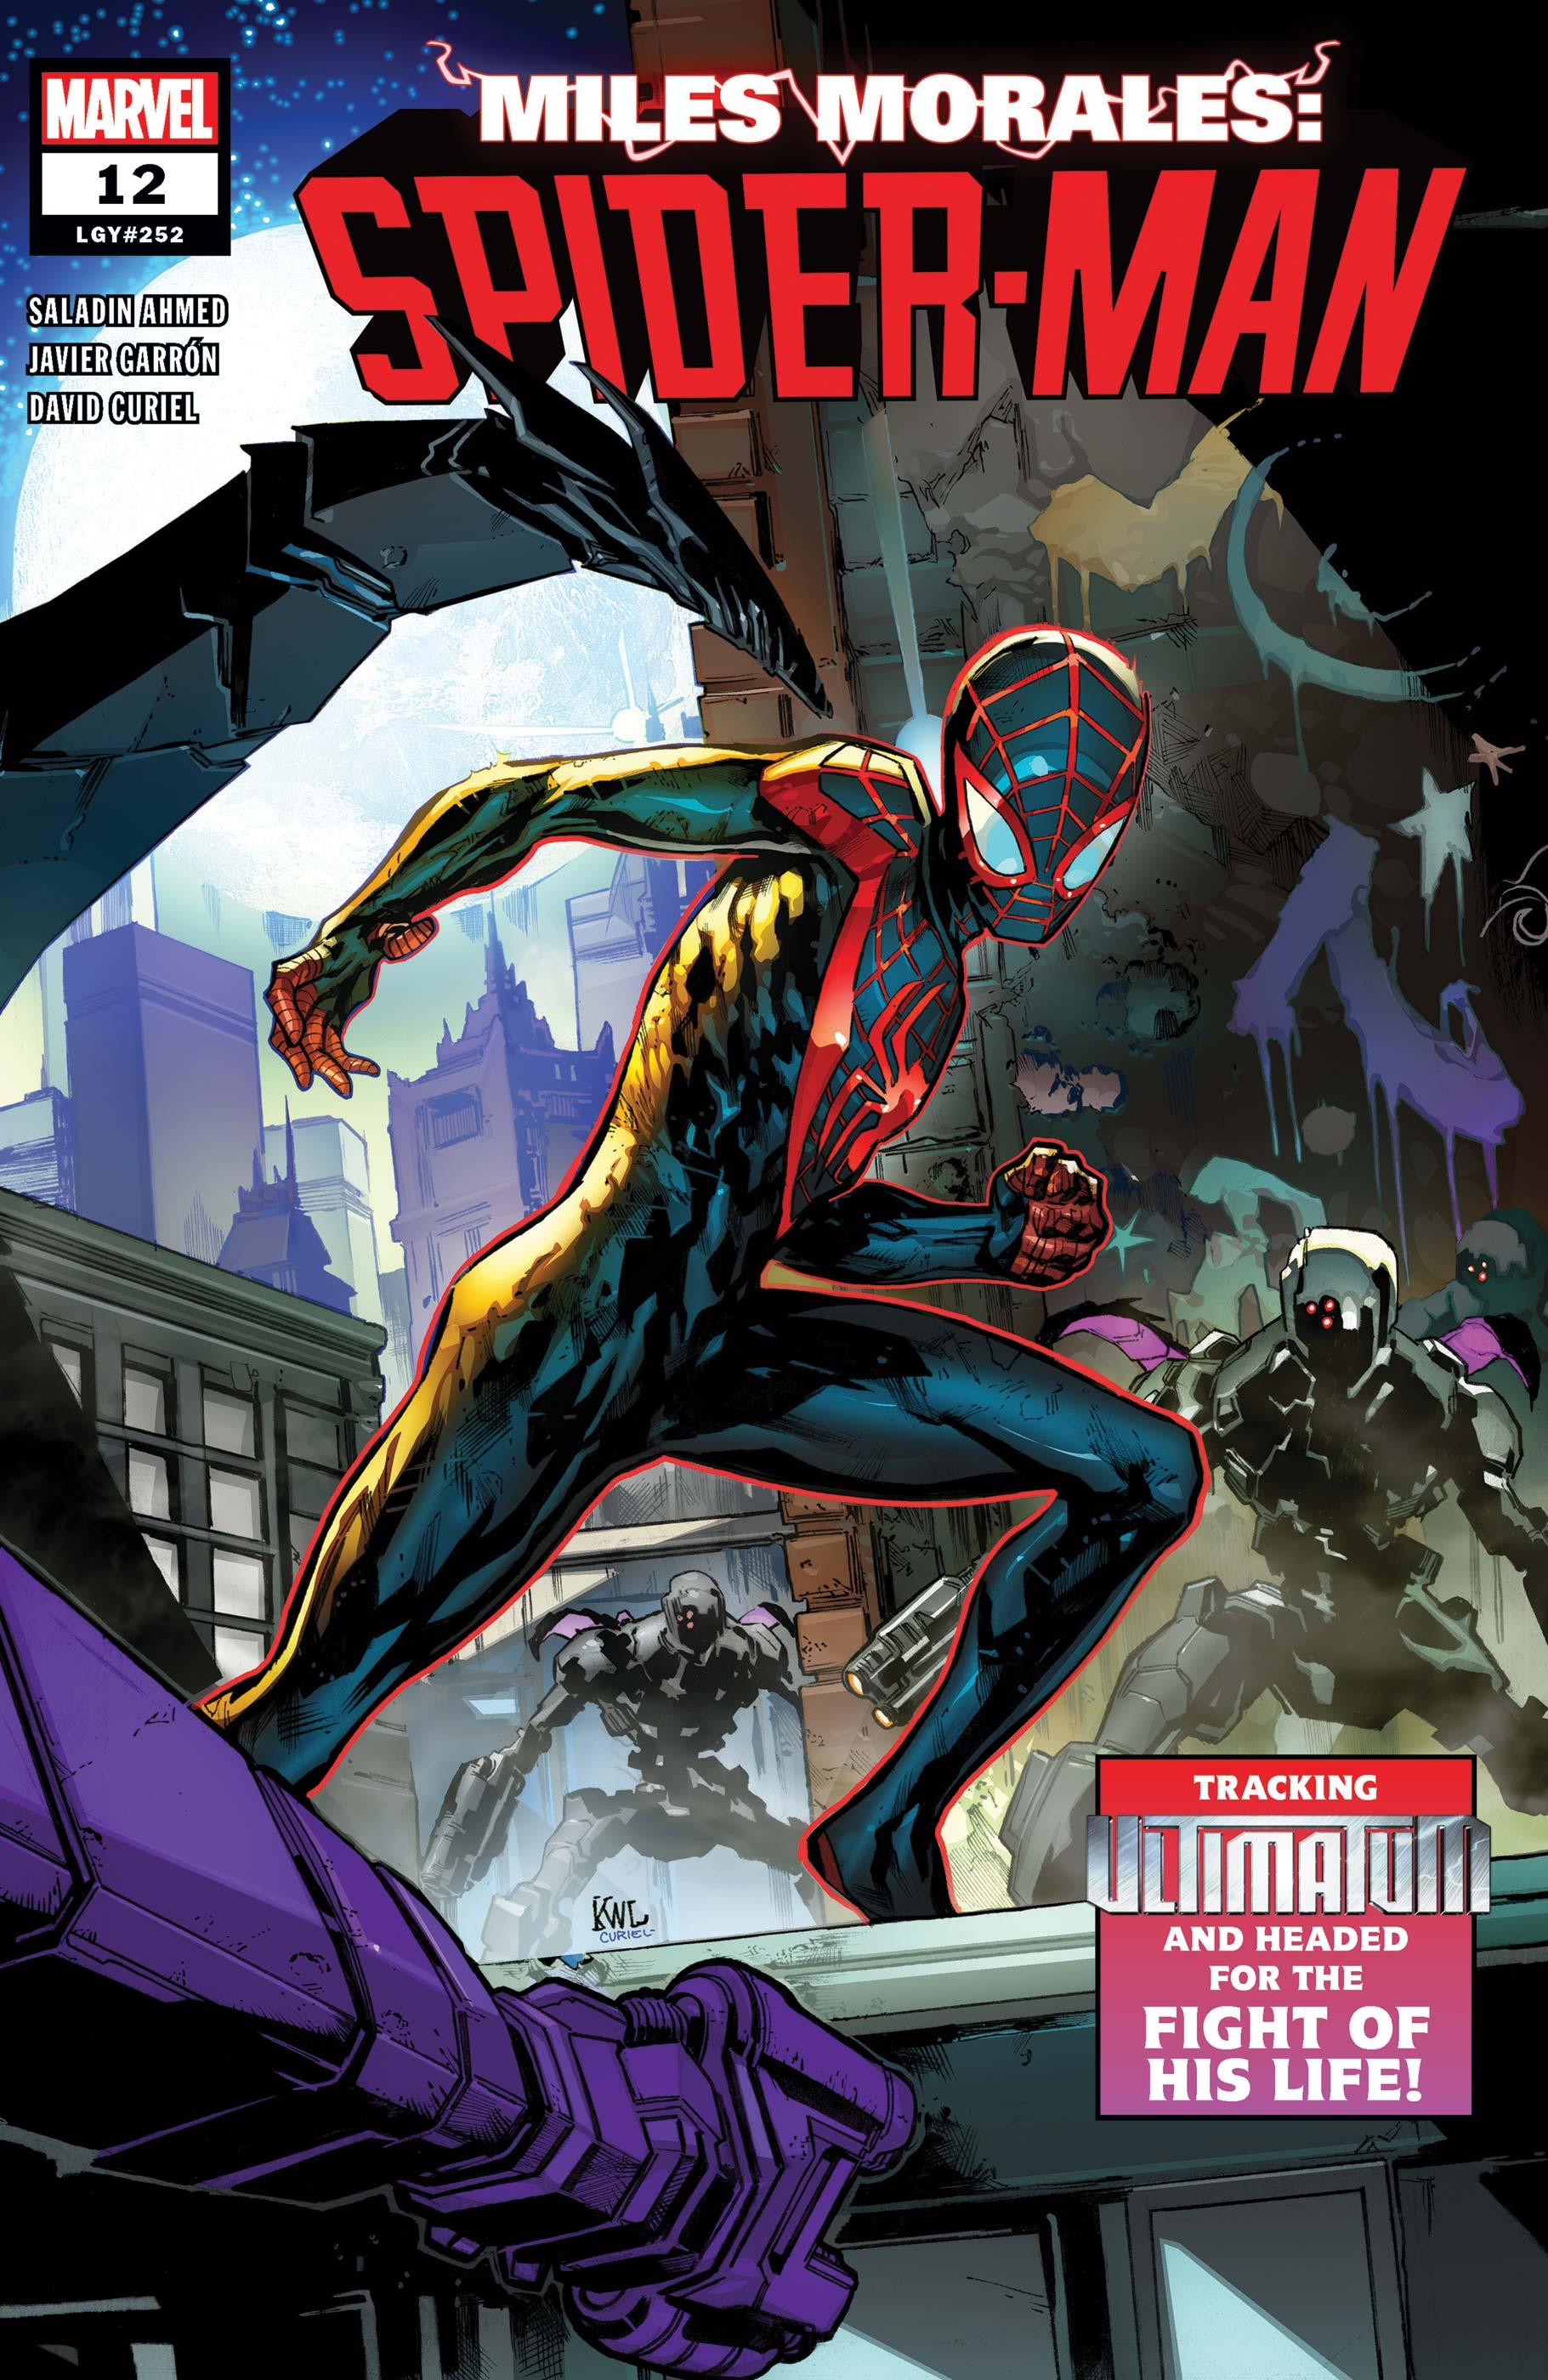 Miles Morales: Spider-Man (2018) #12